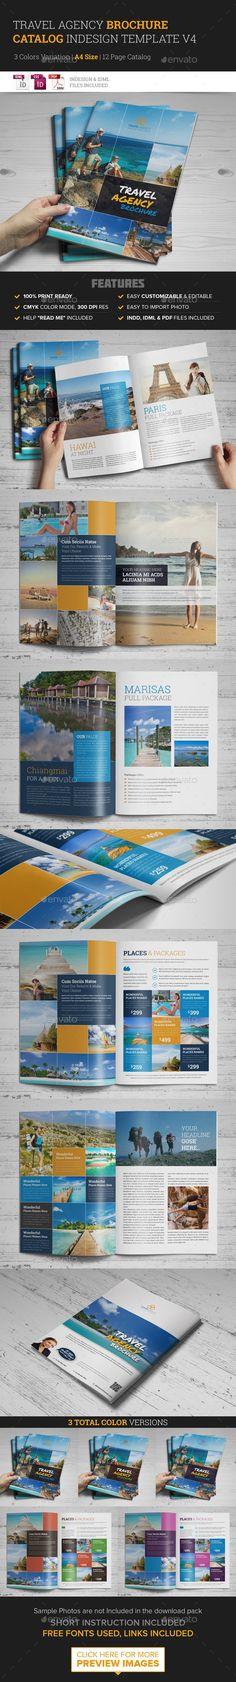 Travel Agency Brochure Catalog InDesign Template #design Download: http://graphicriver.net/item/travel-agency-brochure-catalog-indesign-template-4/10398276?ref=ksioks